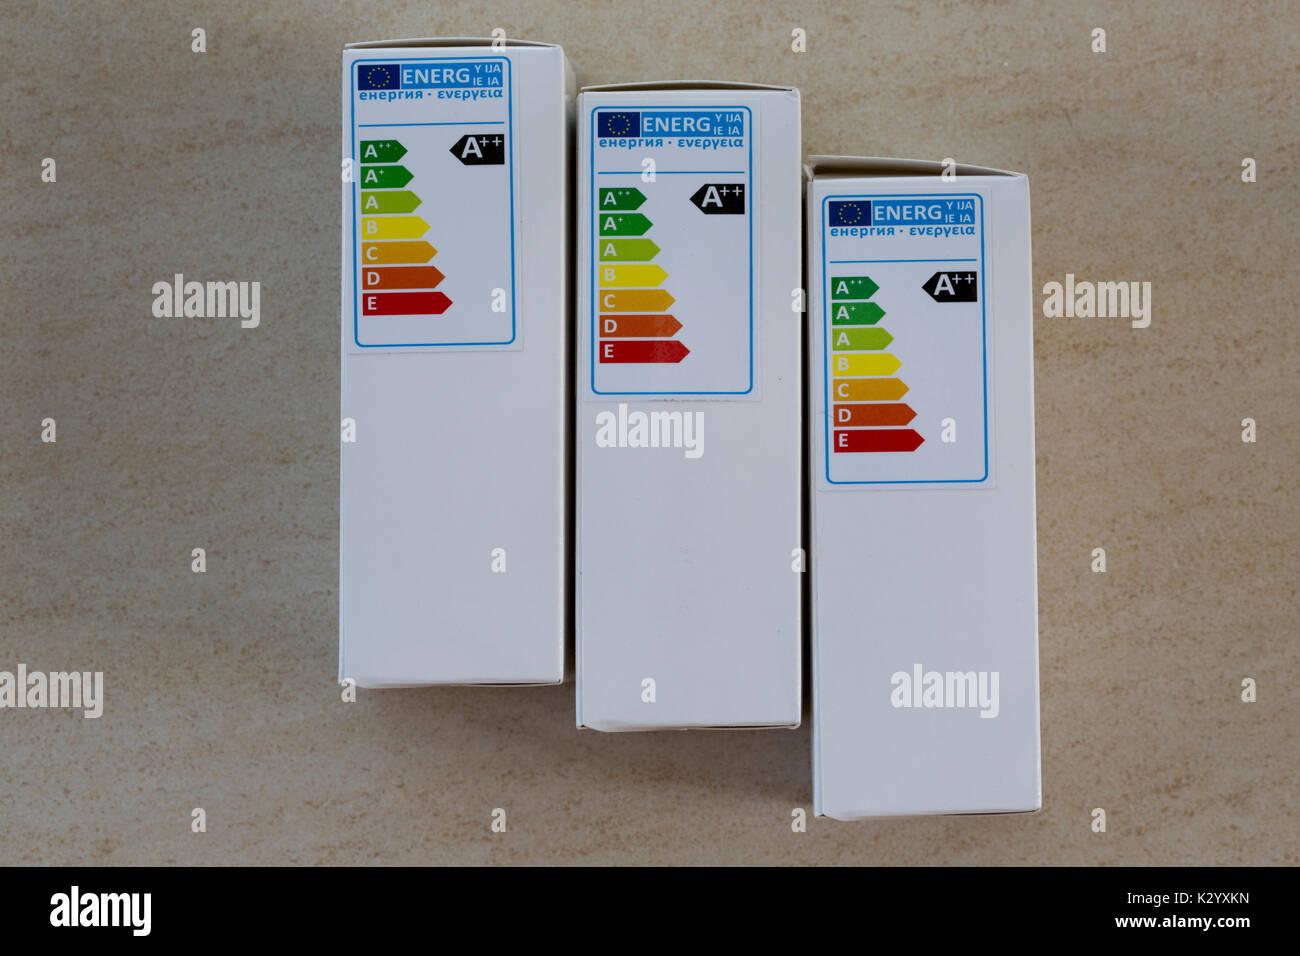 A++ energy efficiency label on LED lamp box UK - Stock Image